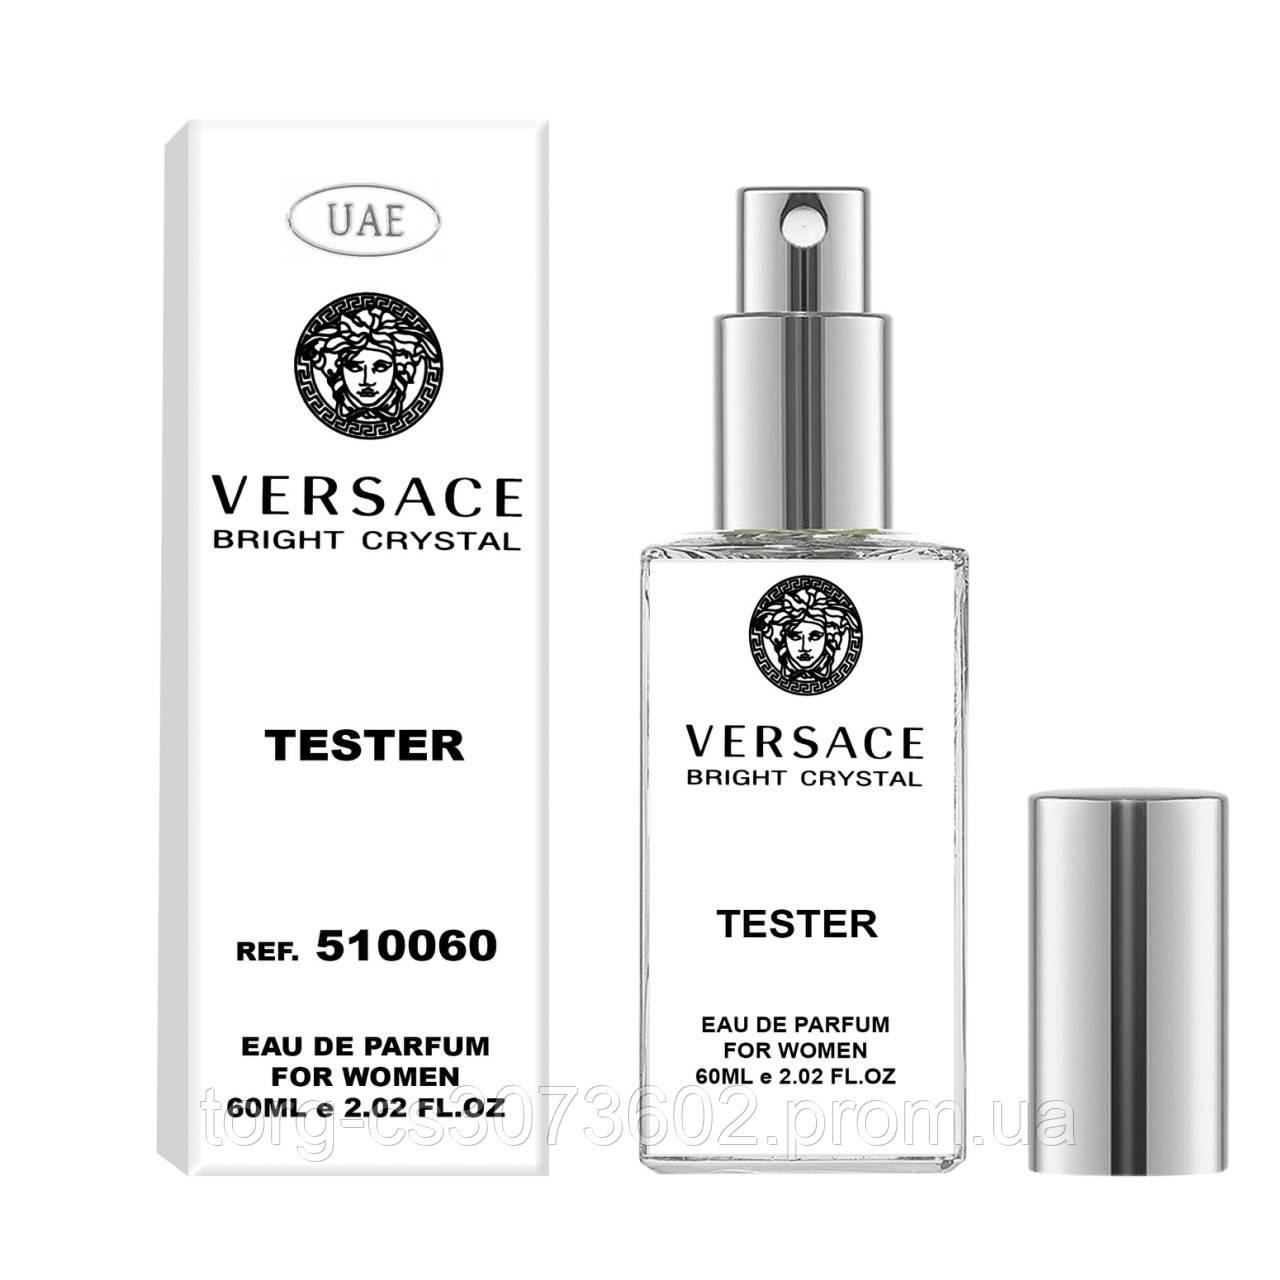 Тестер жіночий UAE Versace Bright Crystal, 60 мл